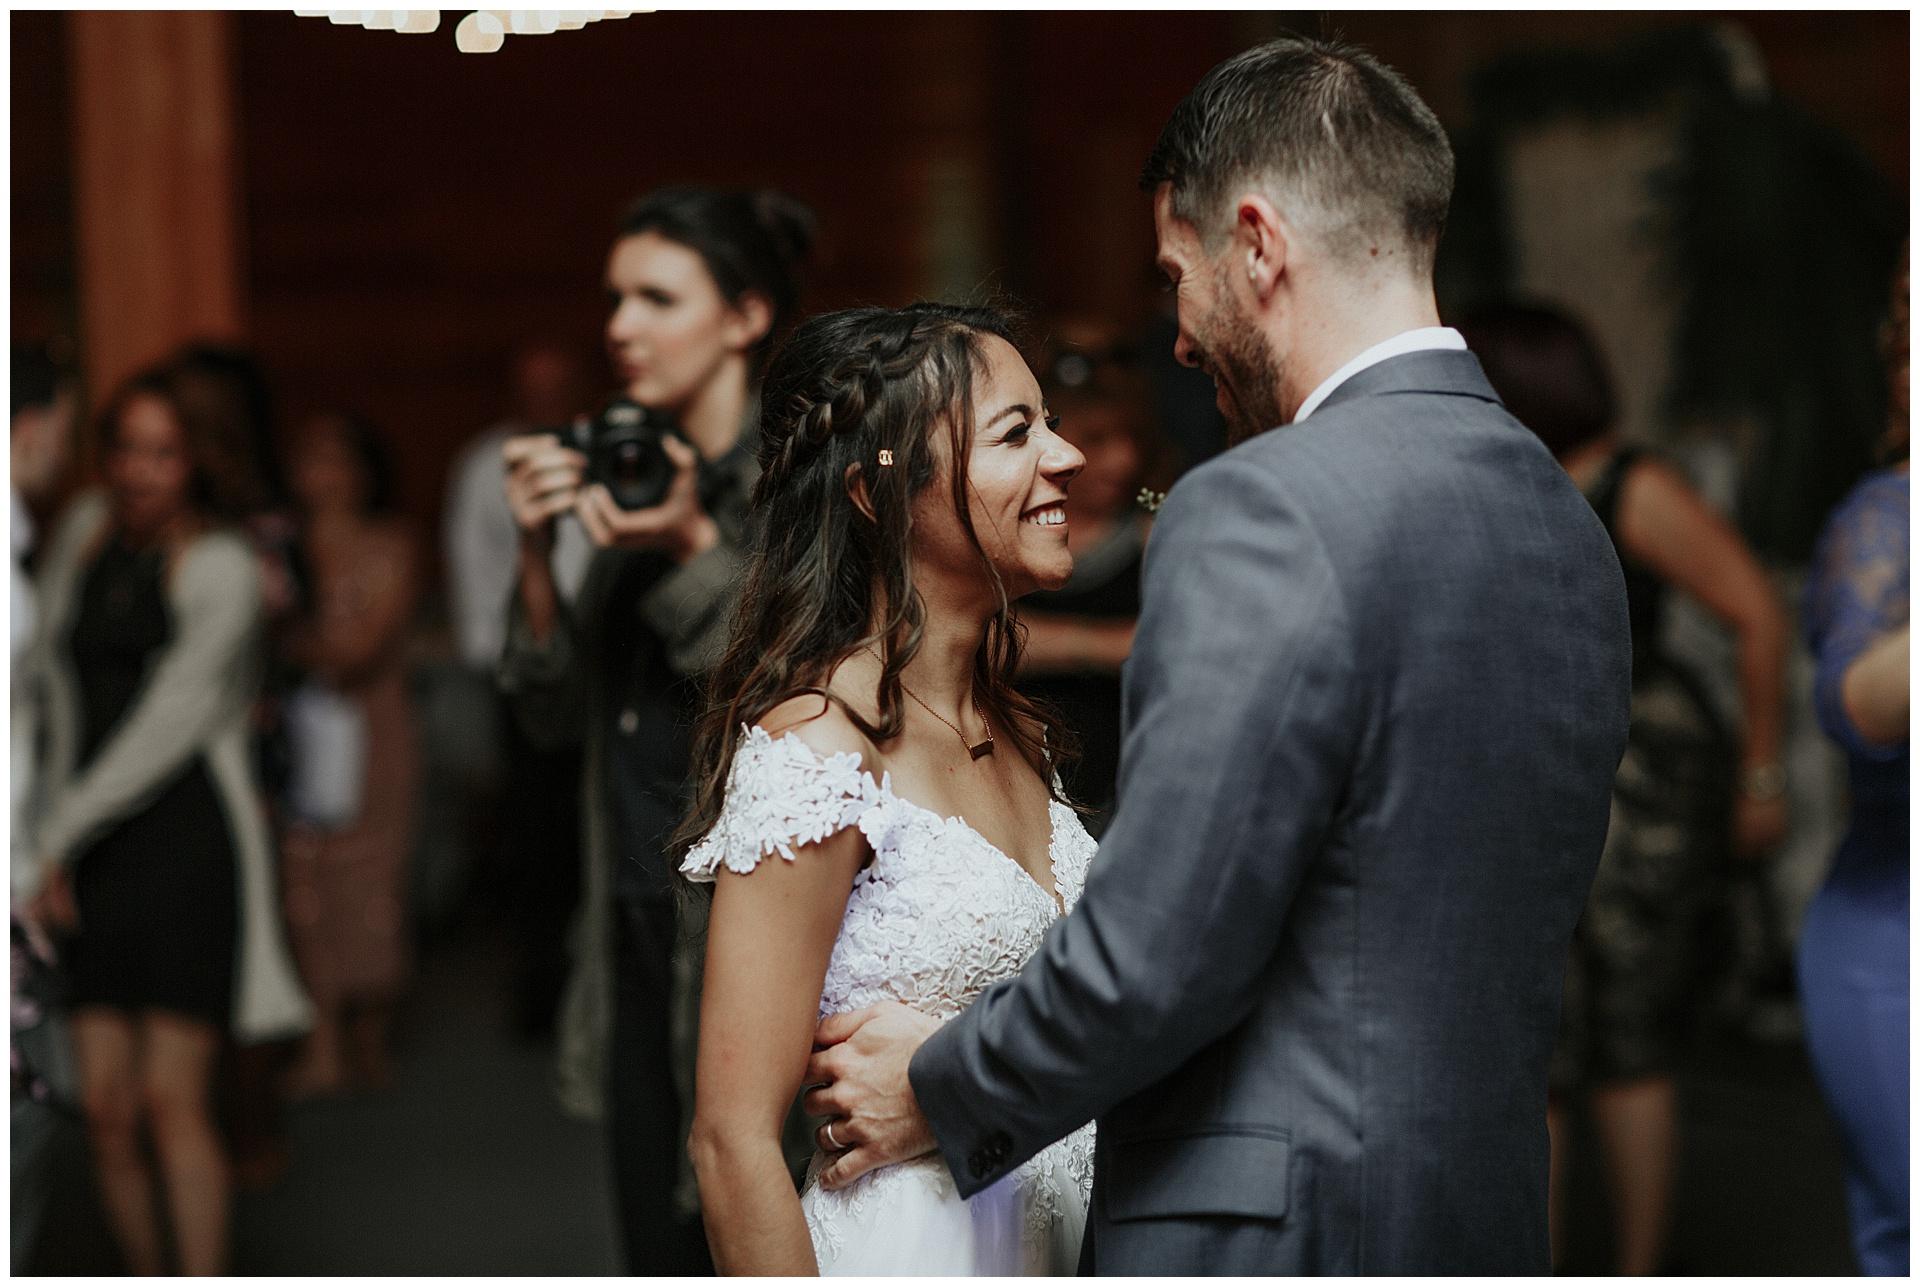 st augustine wedding photographer_mia dimare photography49.jpg